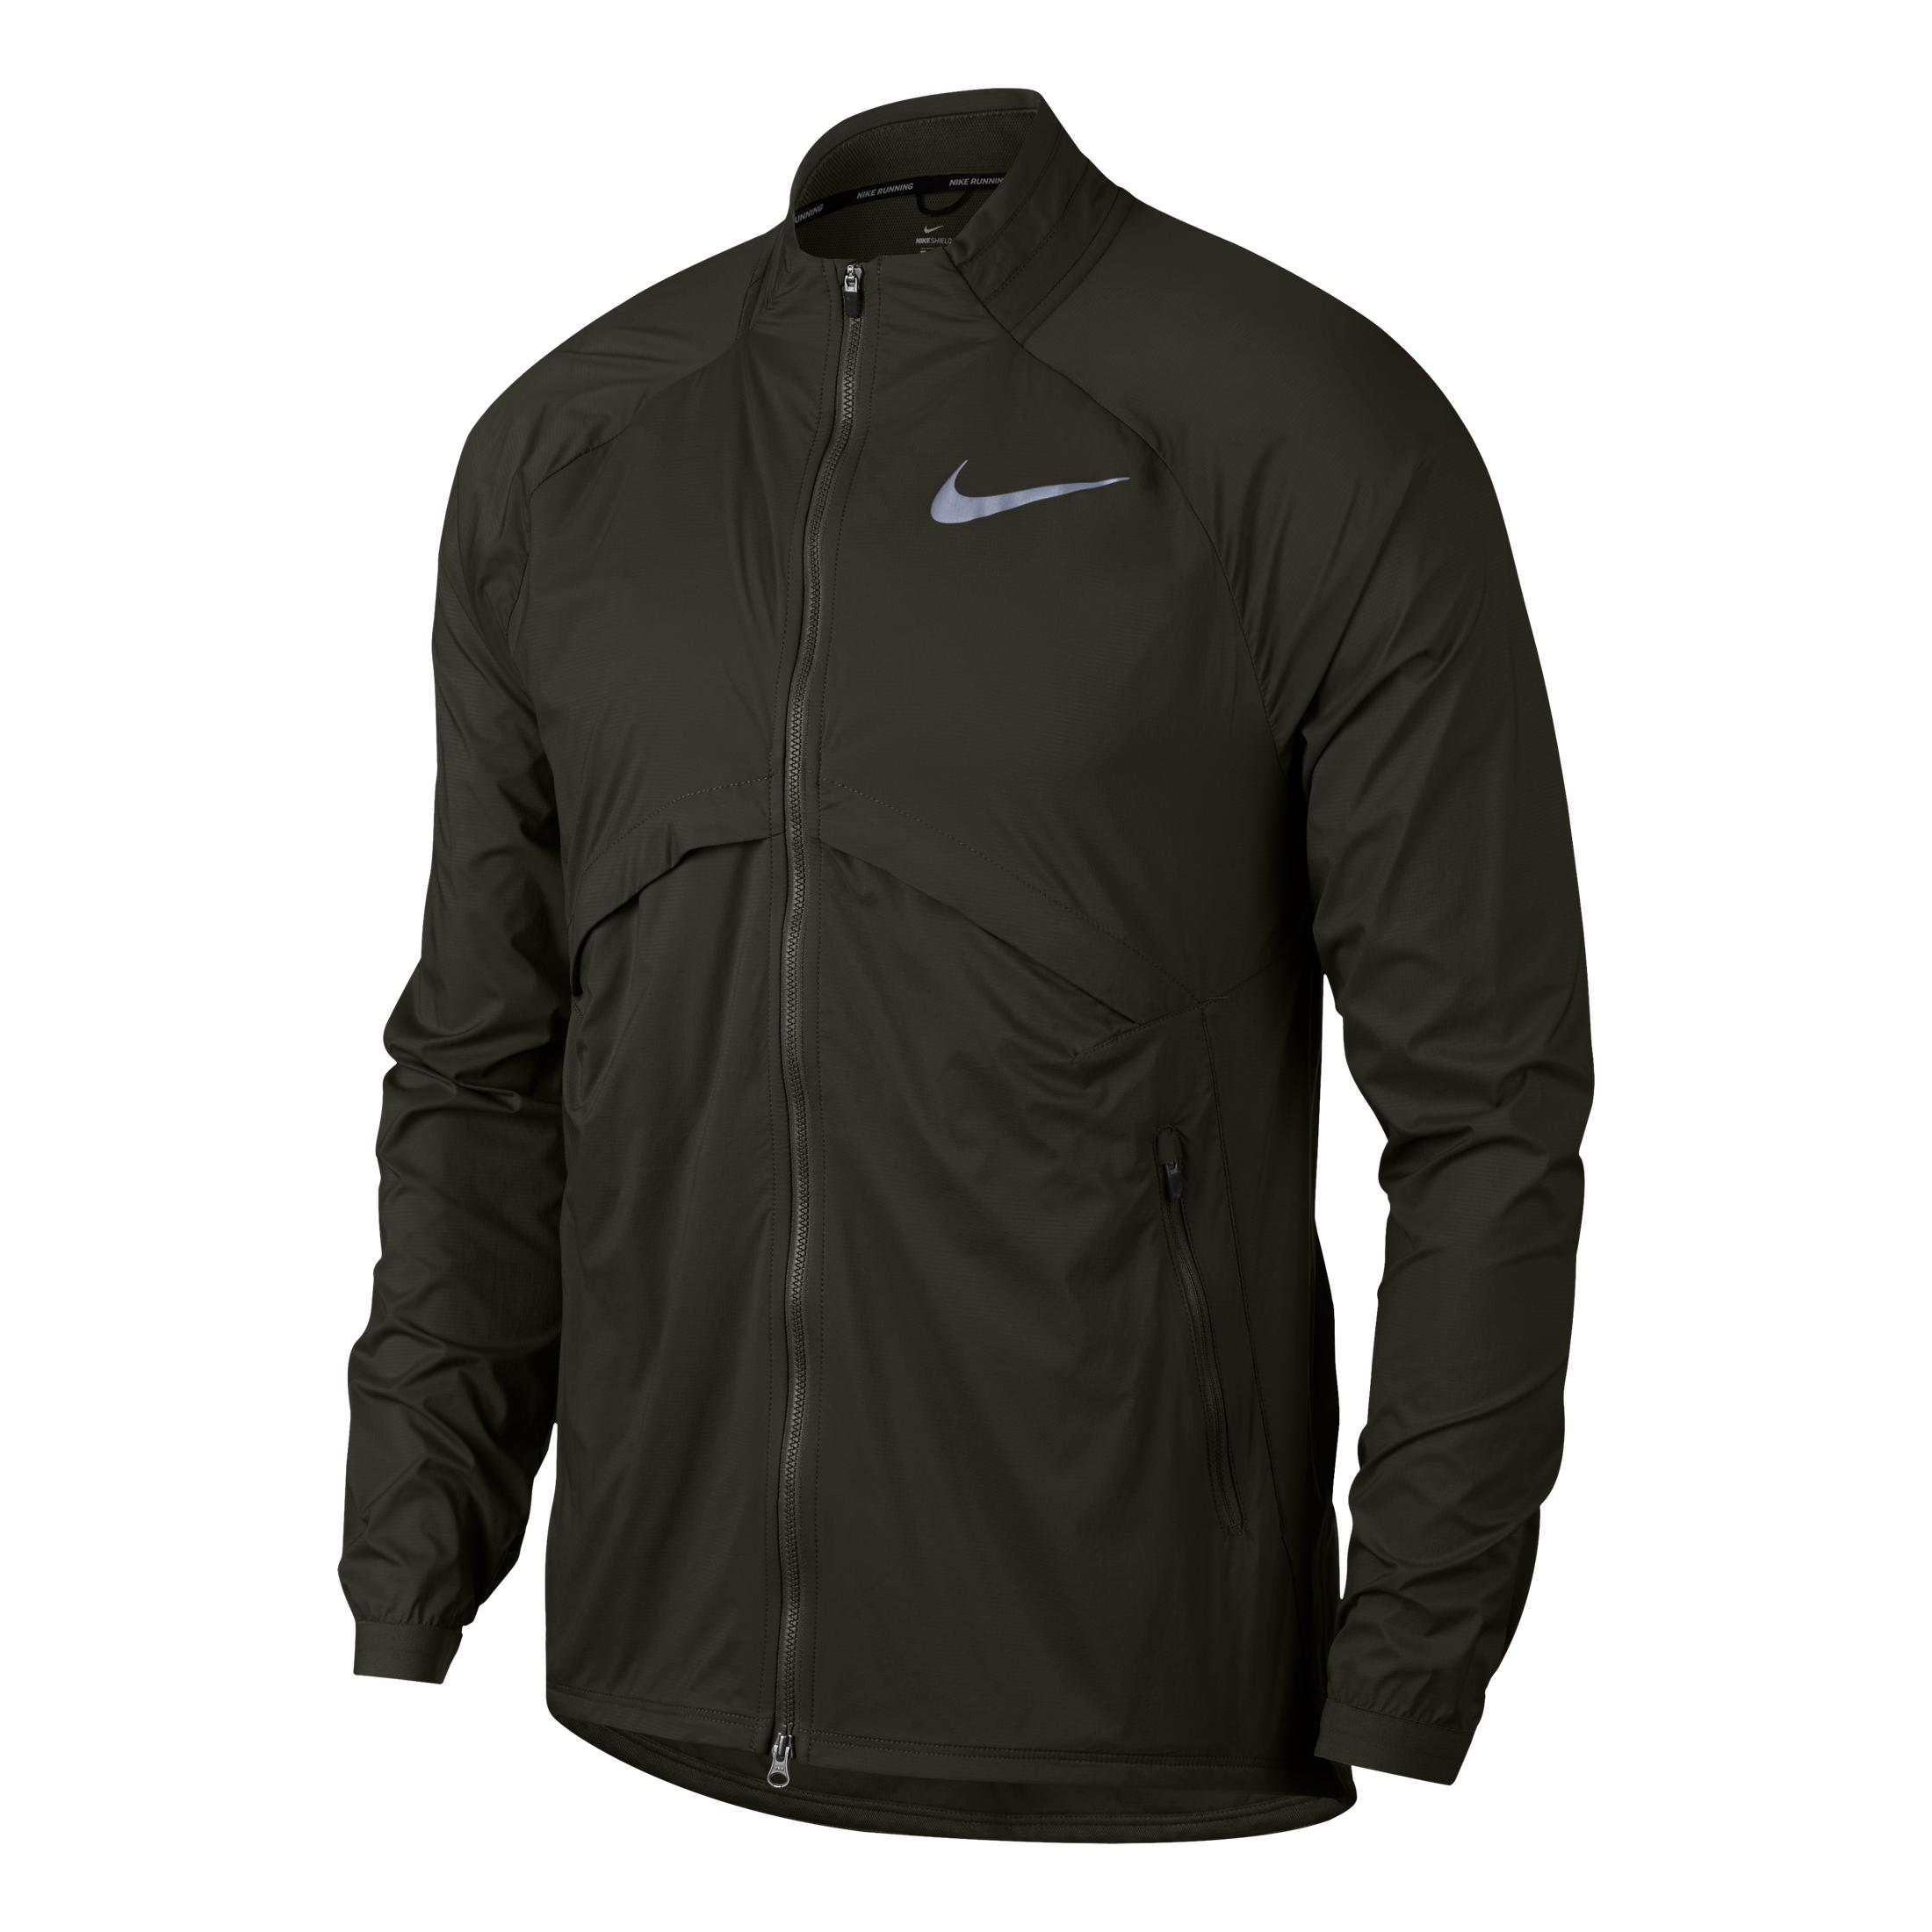 buy good on feet at buy good Nike Shield Convertible Jacket - Kaki - Homme | LEPAPE